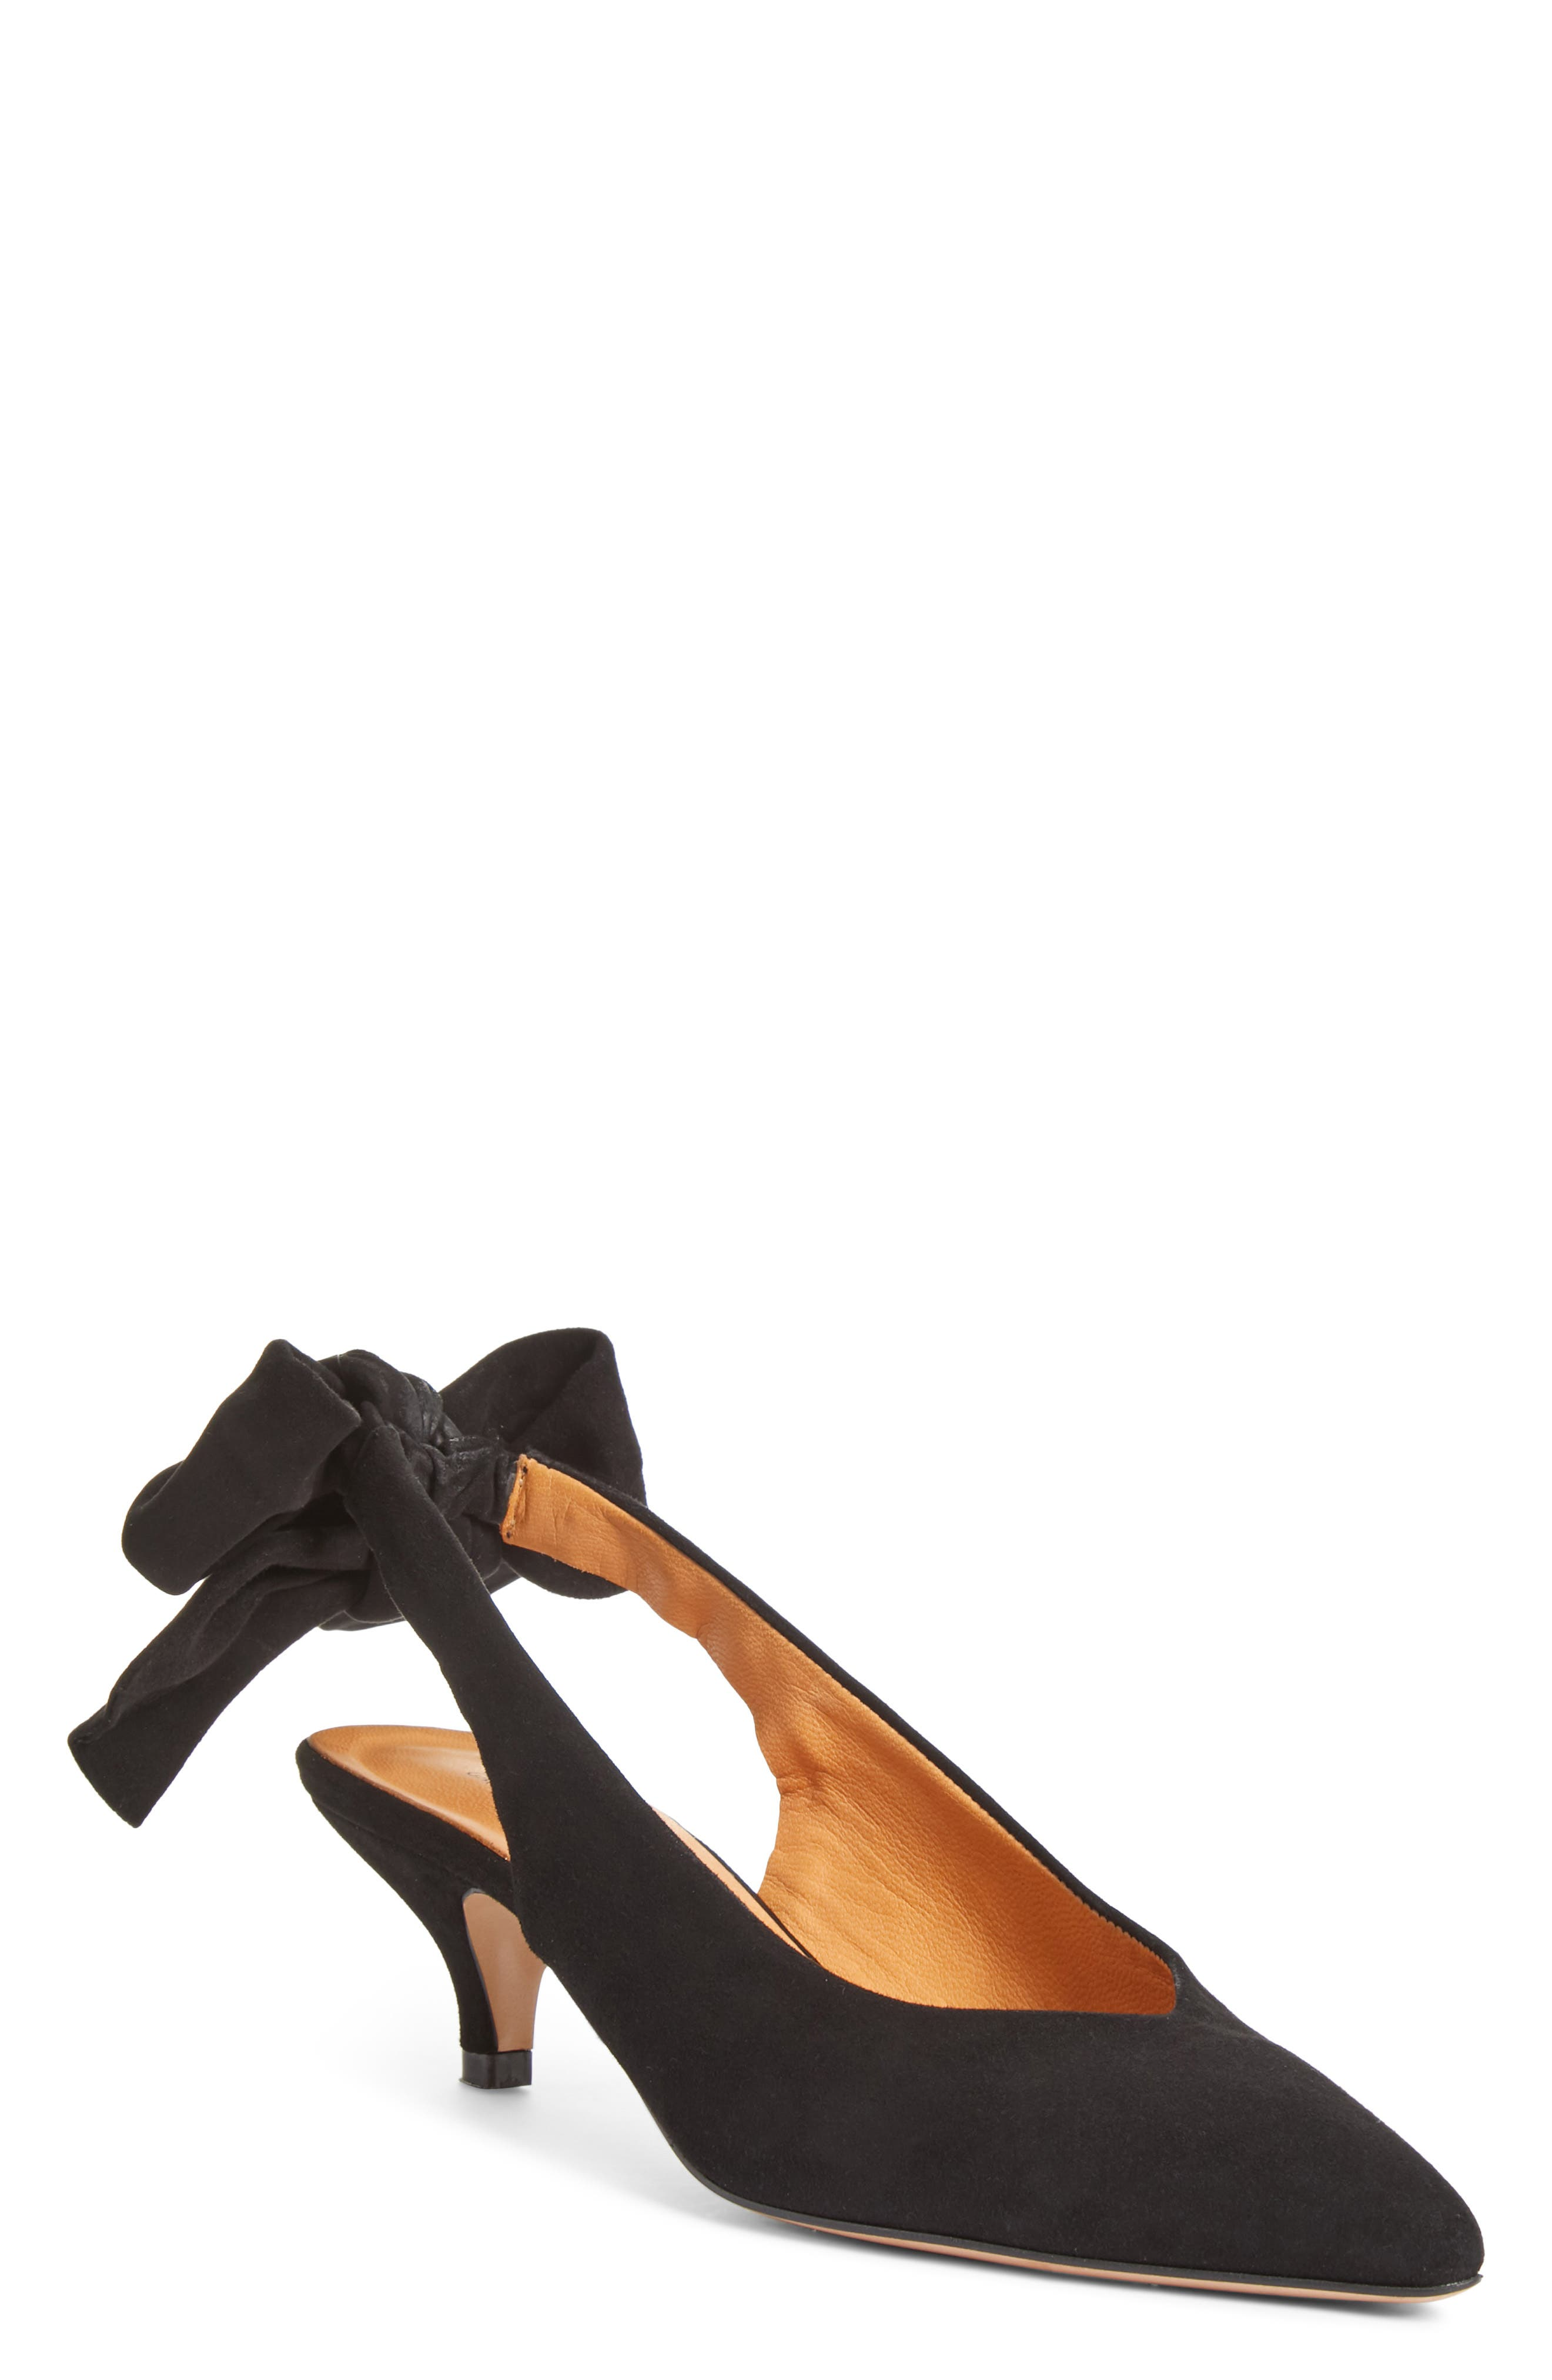 Bow Kitten Heel Pump,                         Main,                         color, BLACK 099